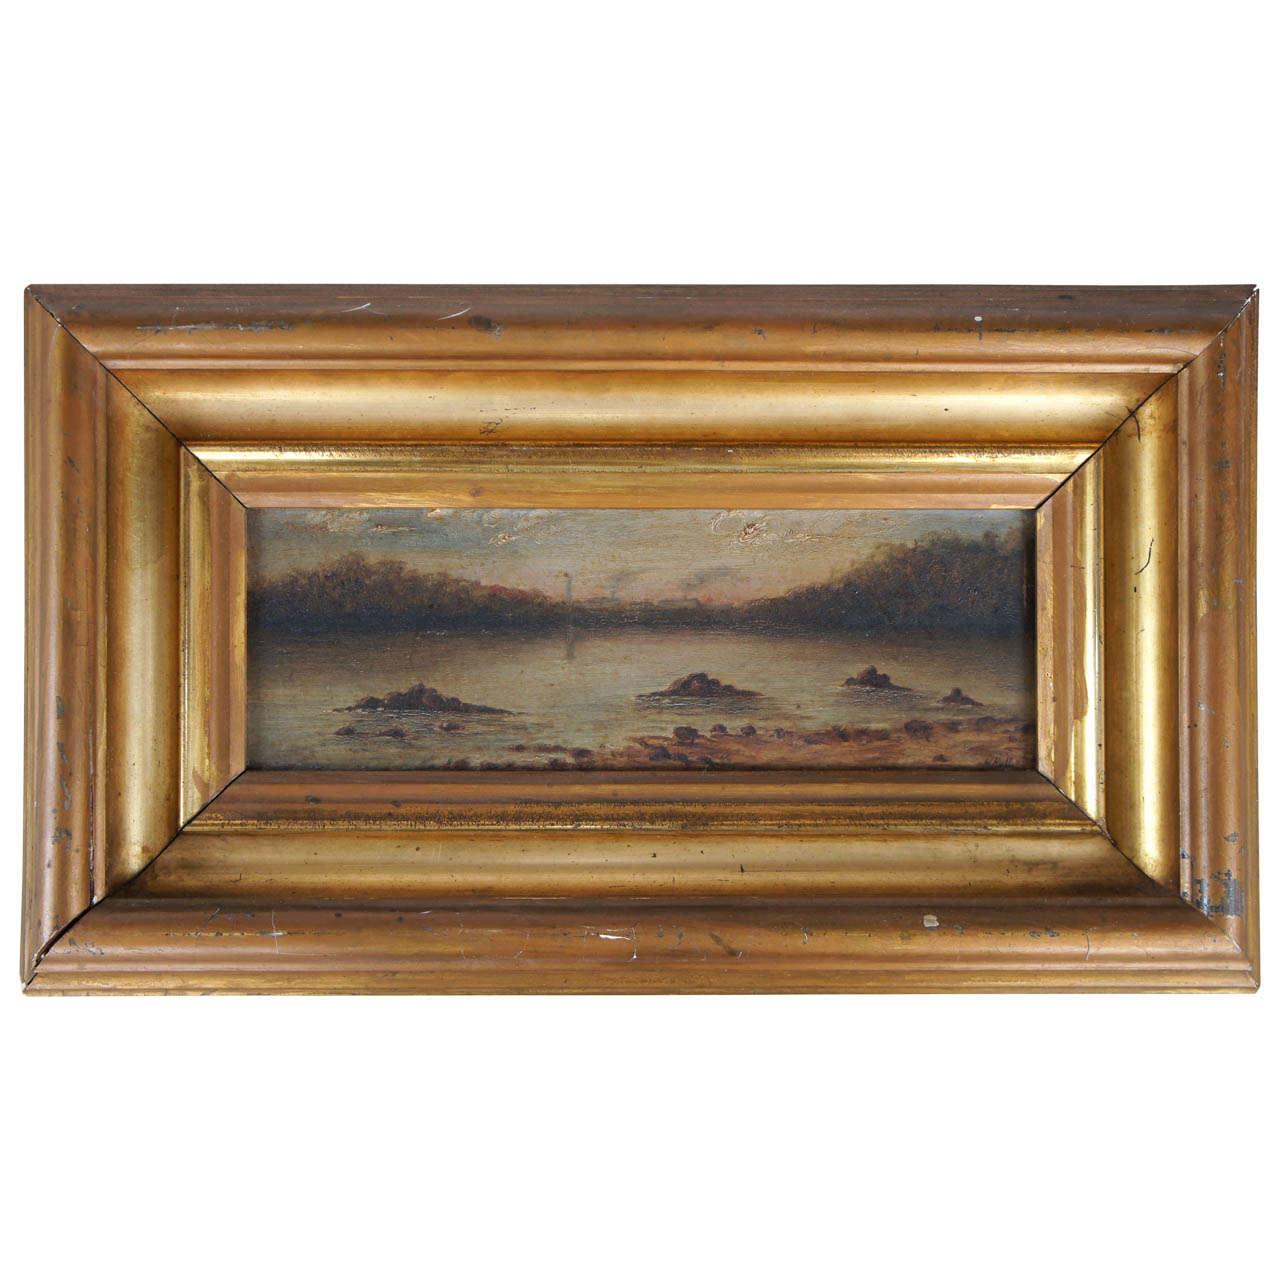 "Diminutive""River View"" Painting"